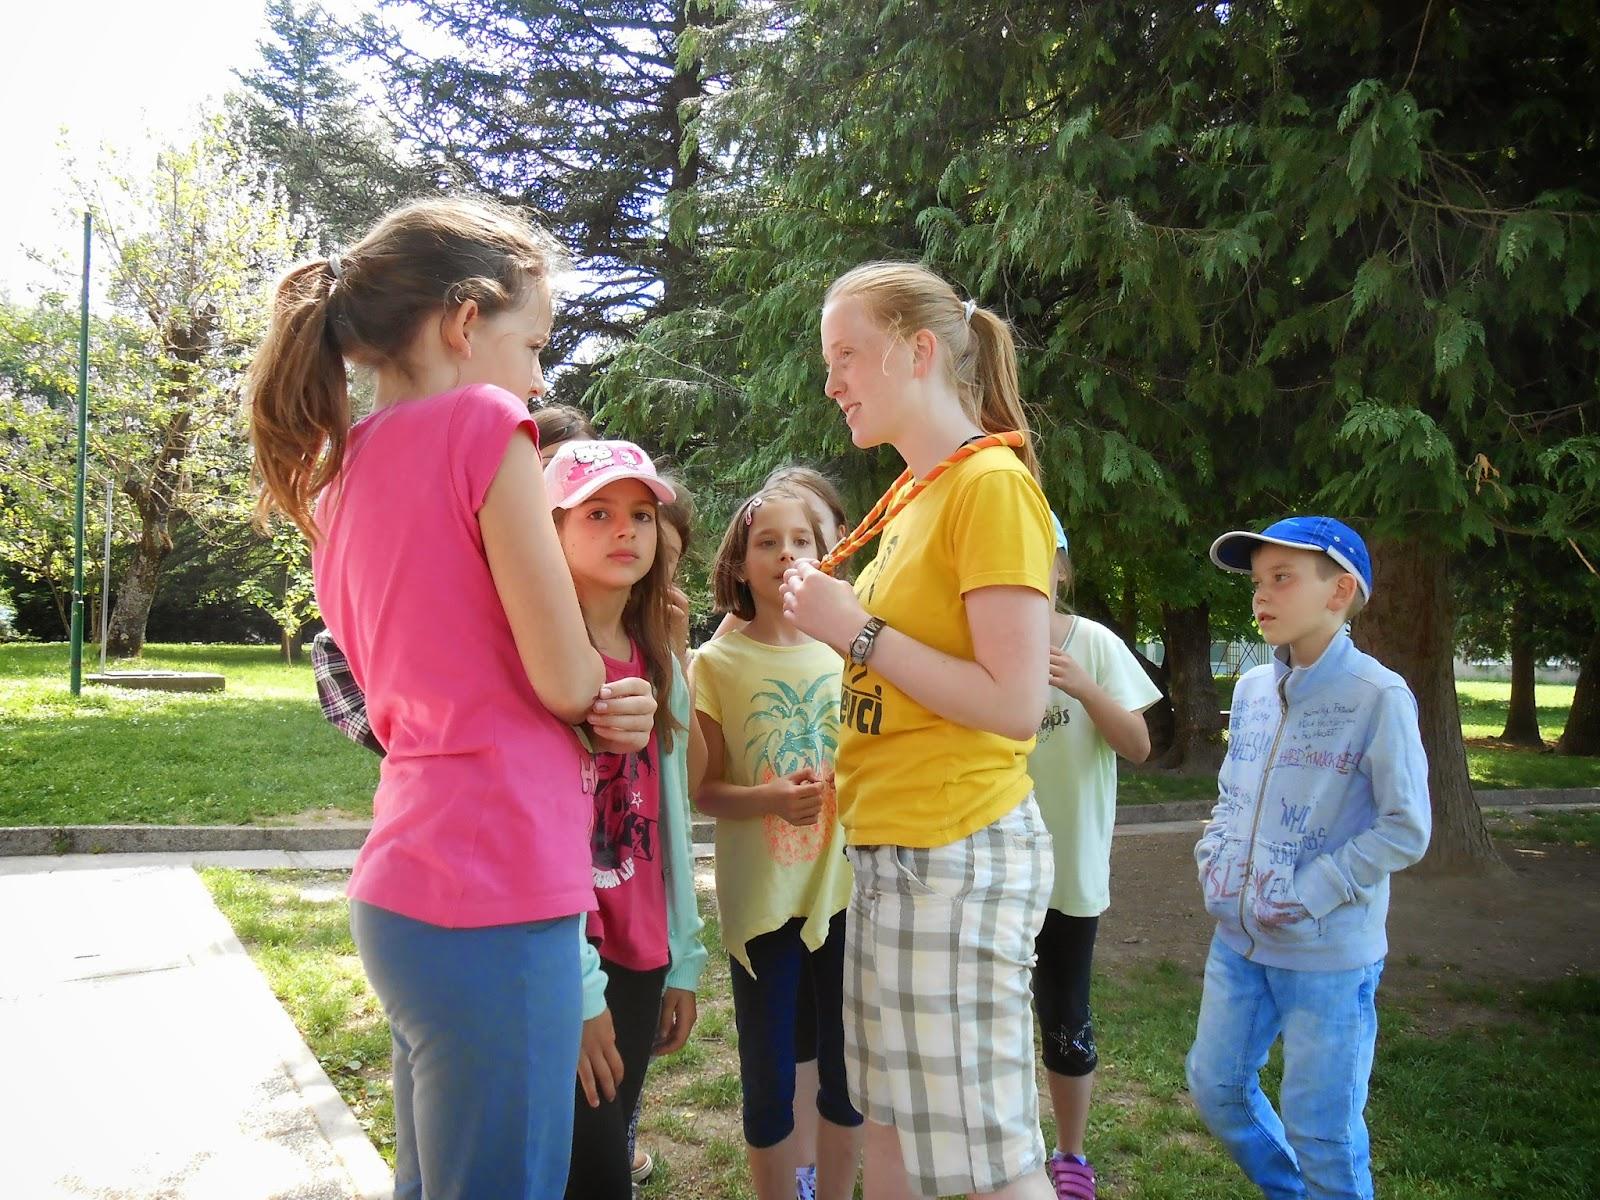 Športni dan 4. a in 4. b, Ilirska Bistrica, 19. 5. 2015 - DSCN4658.JPG